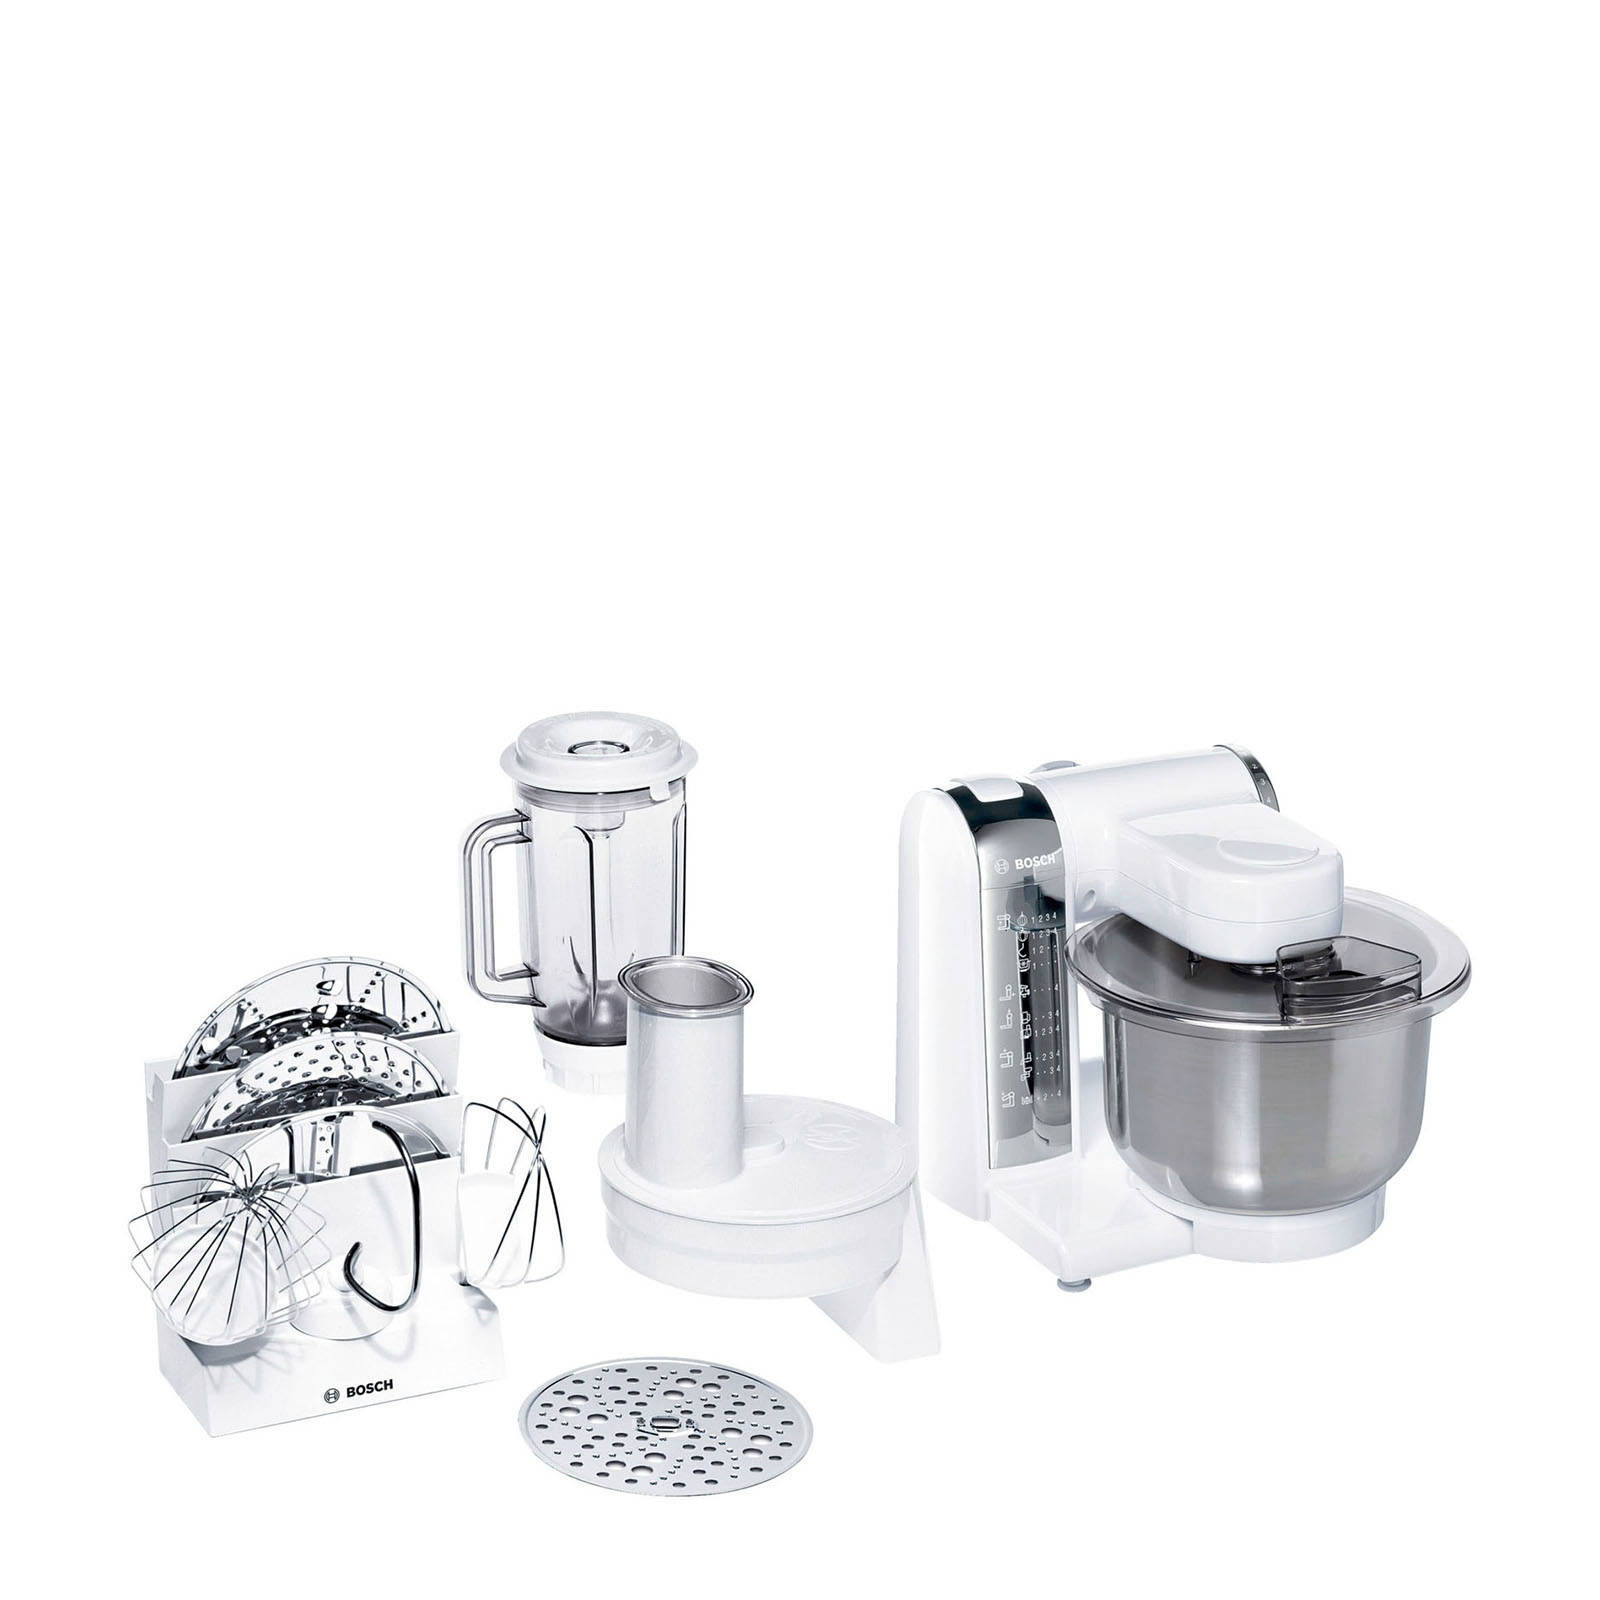 Bosch MUM48CR1 Keukenmachine Wit online kopen